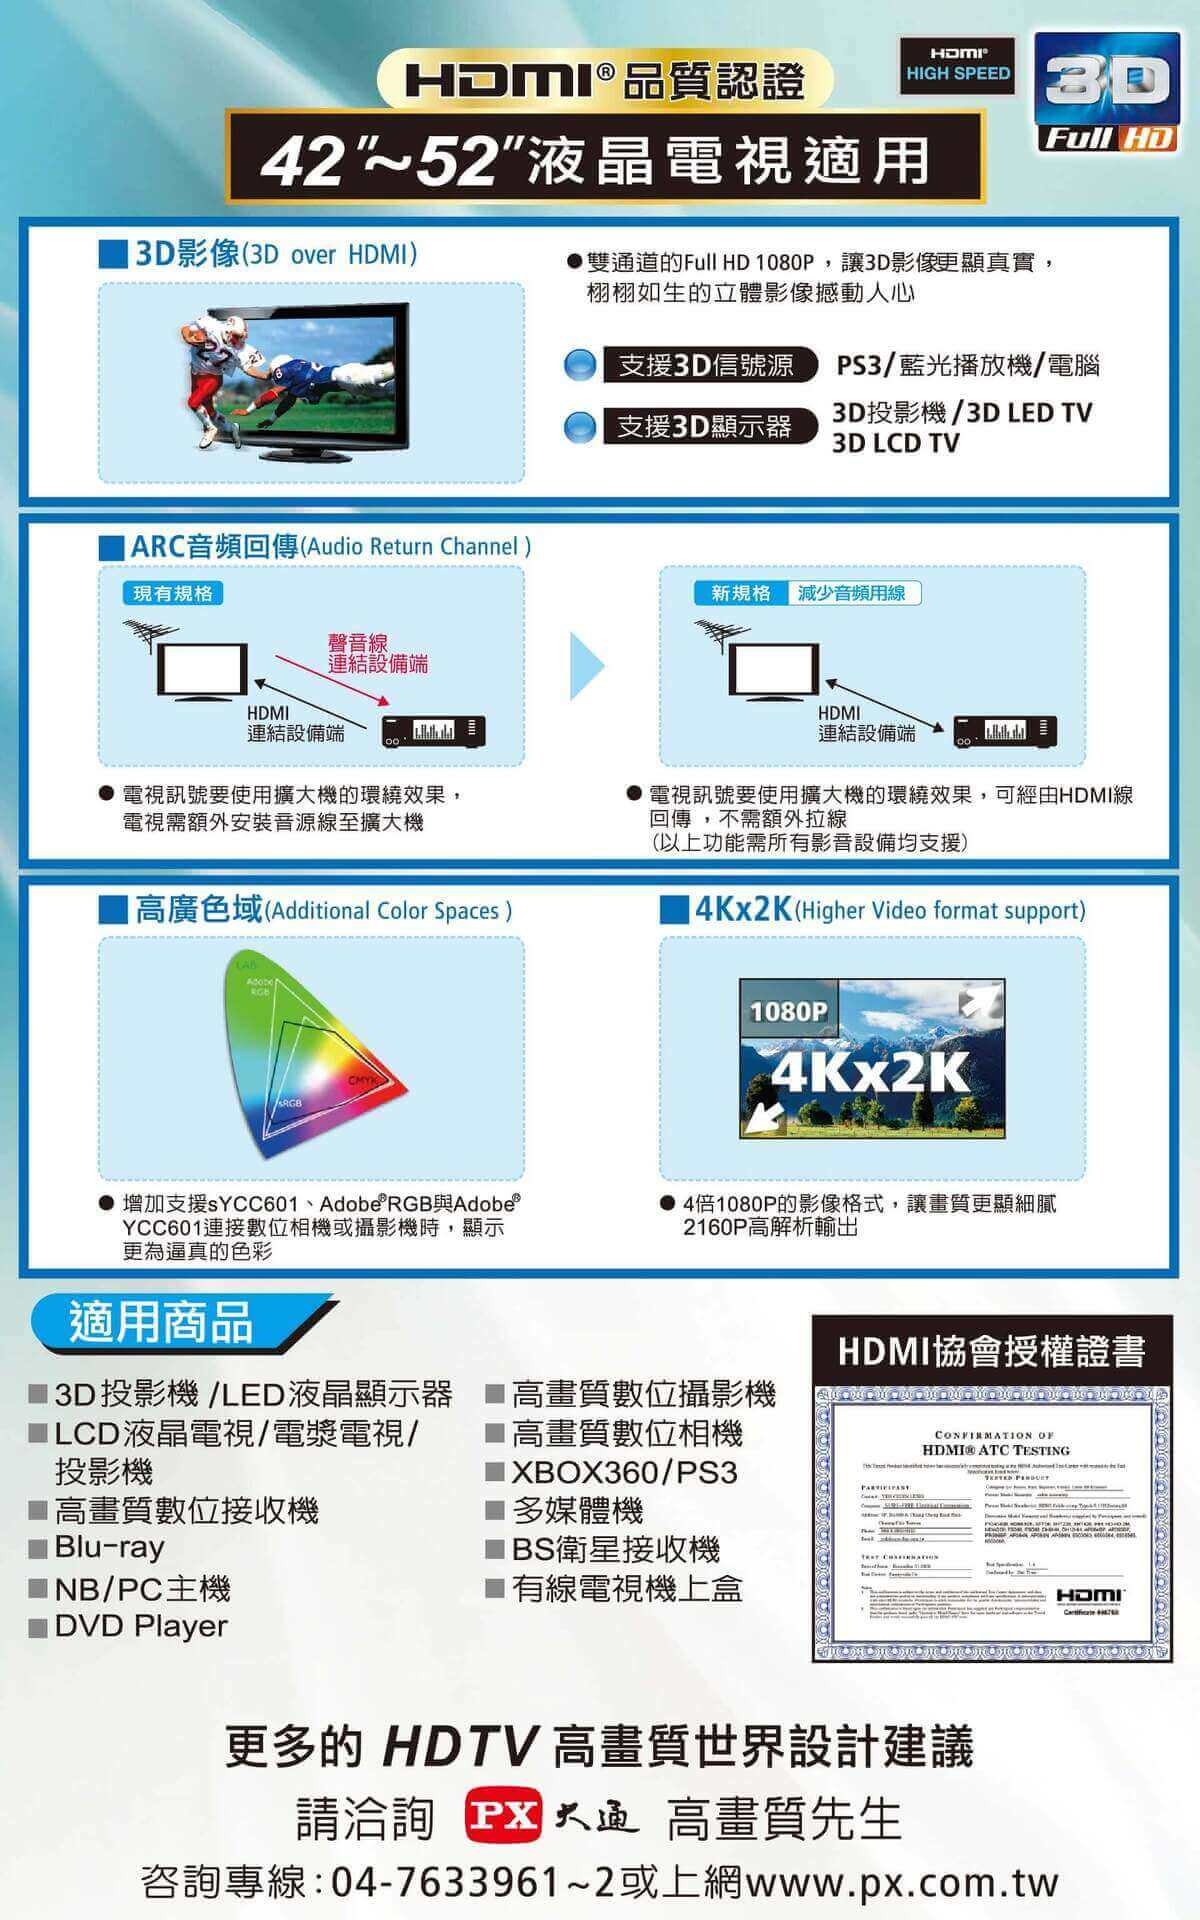 proimages/product/pro-02/pro02-001/HDMI-3MM/HDMI-3MM-4.jpg